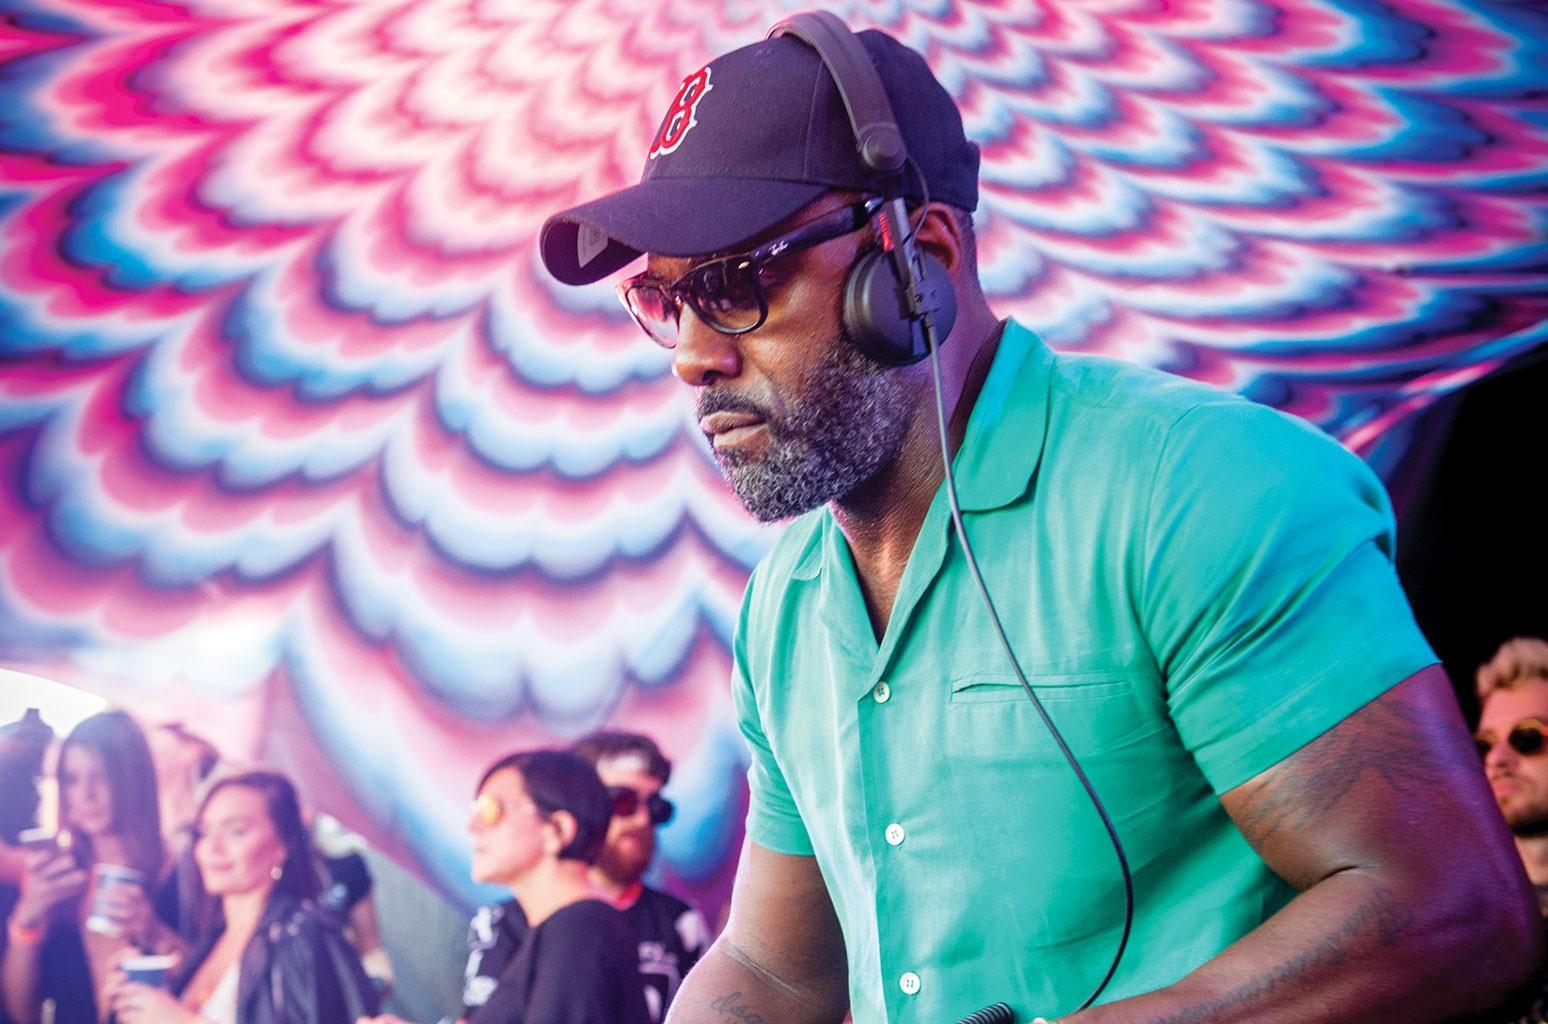 Idris Elba Has a Megan Thee Stallion Collaboration Coming